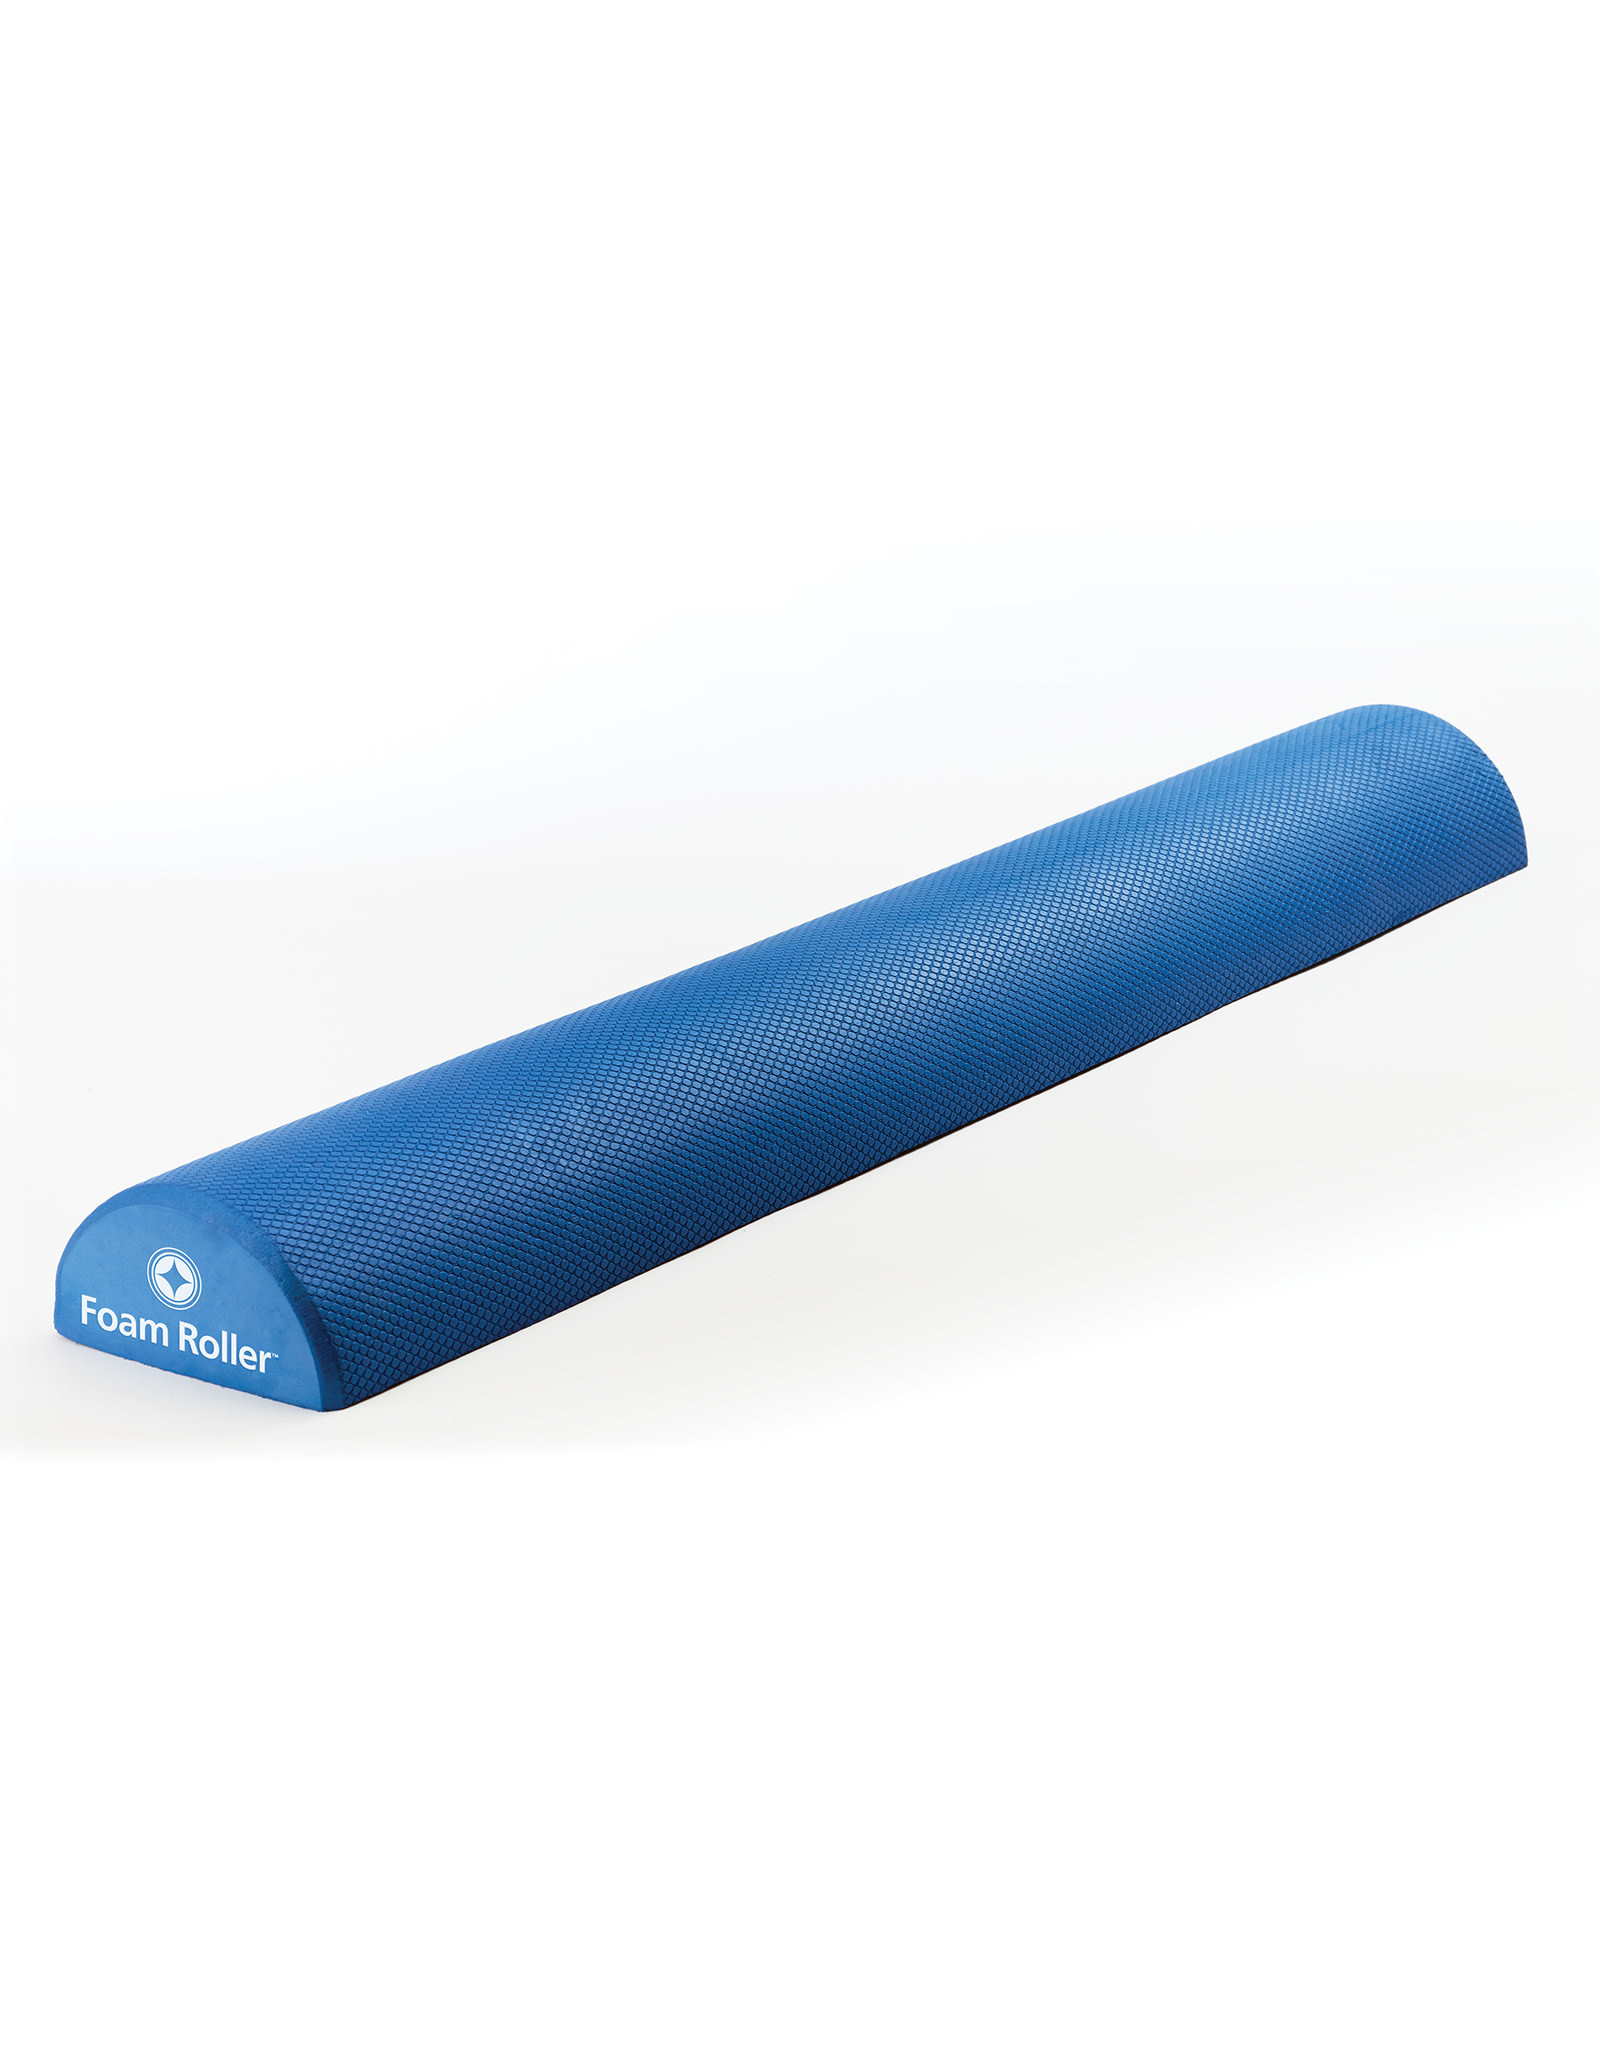 "MERRITHEW Foam Roller™, Soft Density, HALF  -  36"" (blue)"